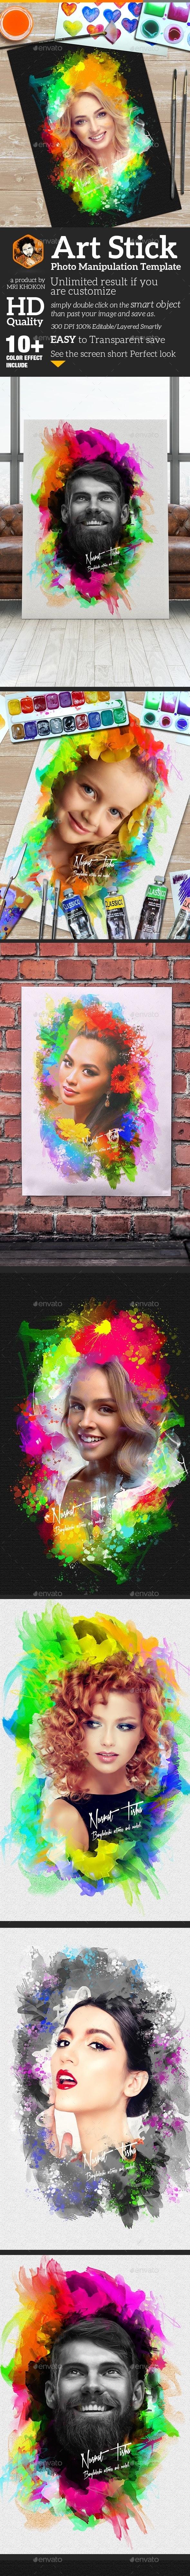 Artistic Photo Manipulation Template - Photo Templates Graphics